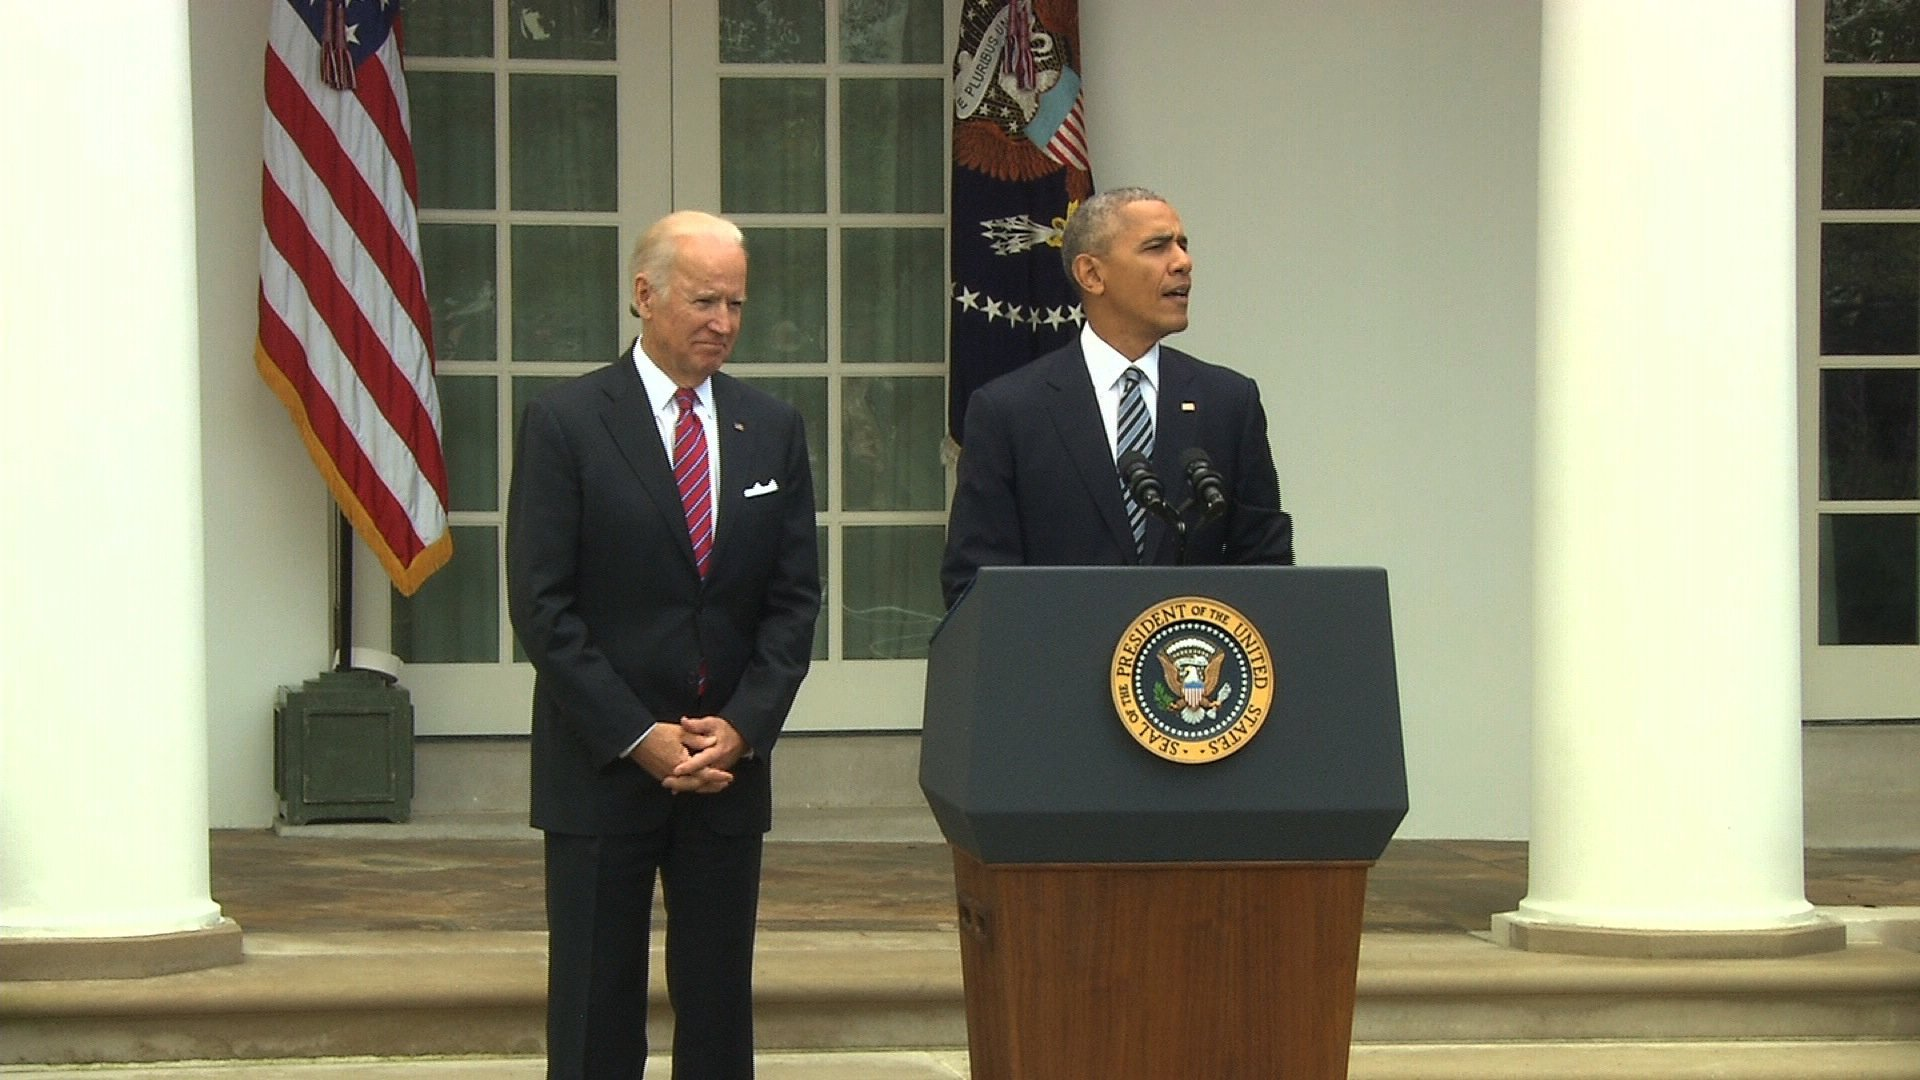 25 Of The Best Biden/Obama Tweets!!!